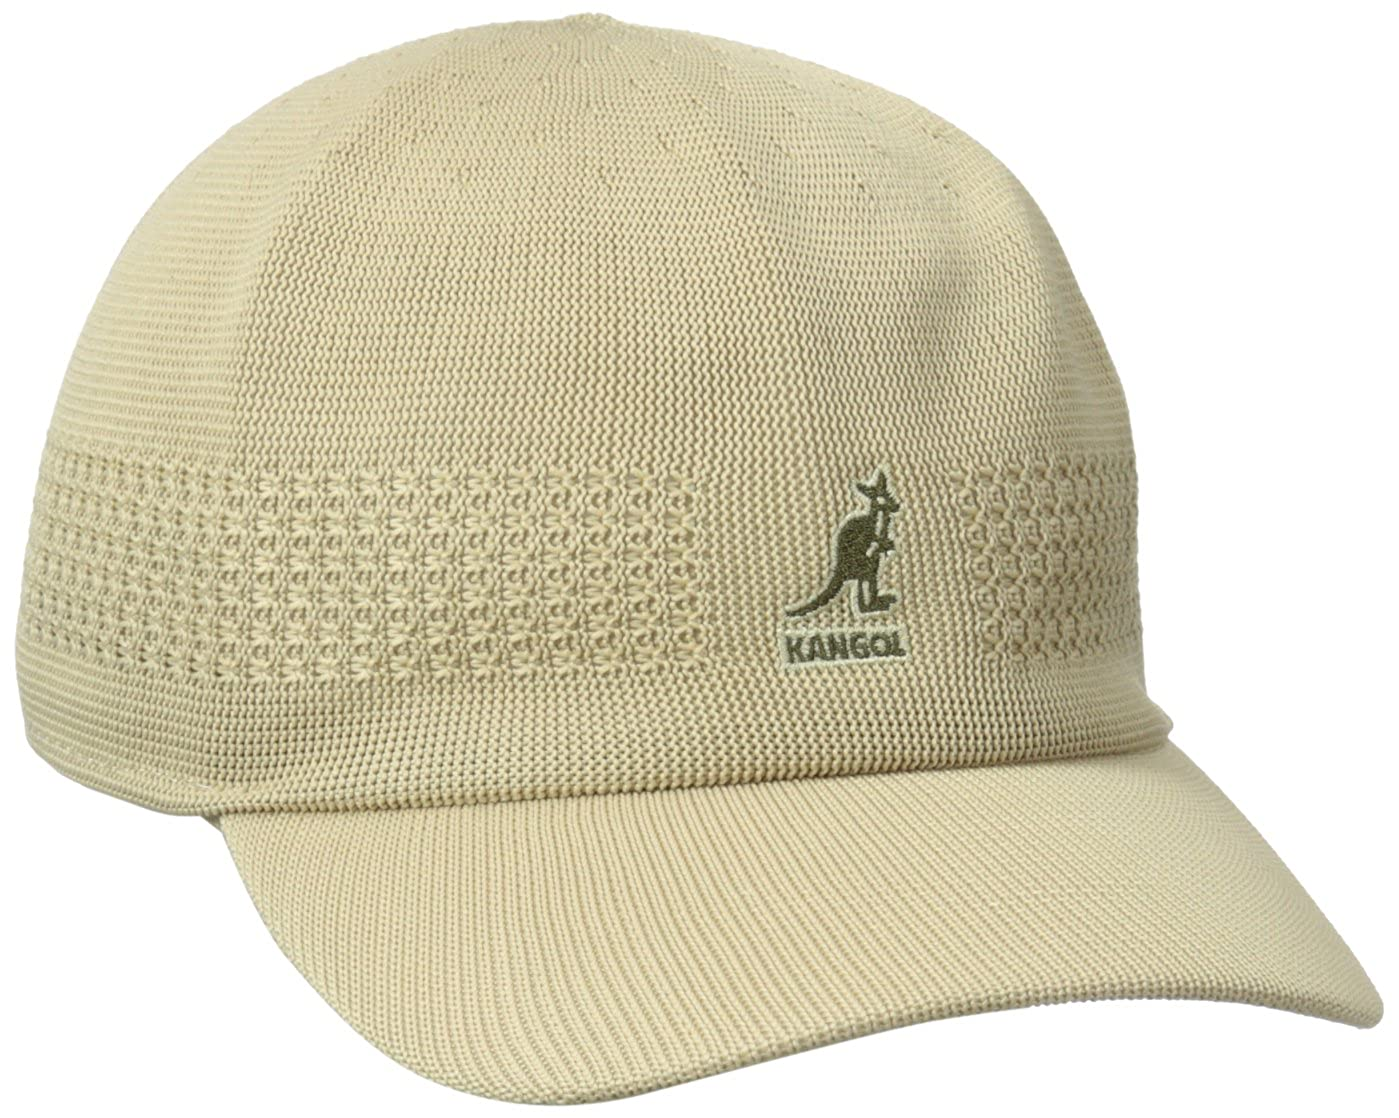 Kangol Men s Tropic Ventair Space Cap at Amazon Men s Clothing store  f0aa01368192